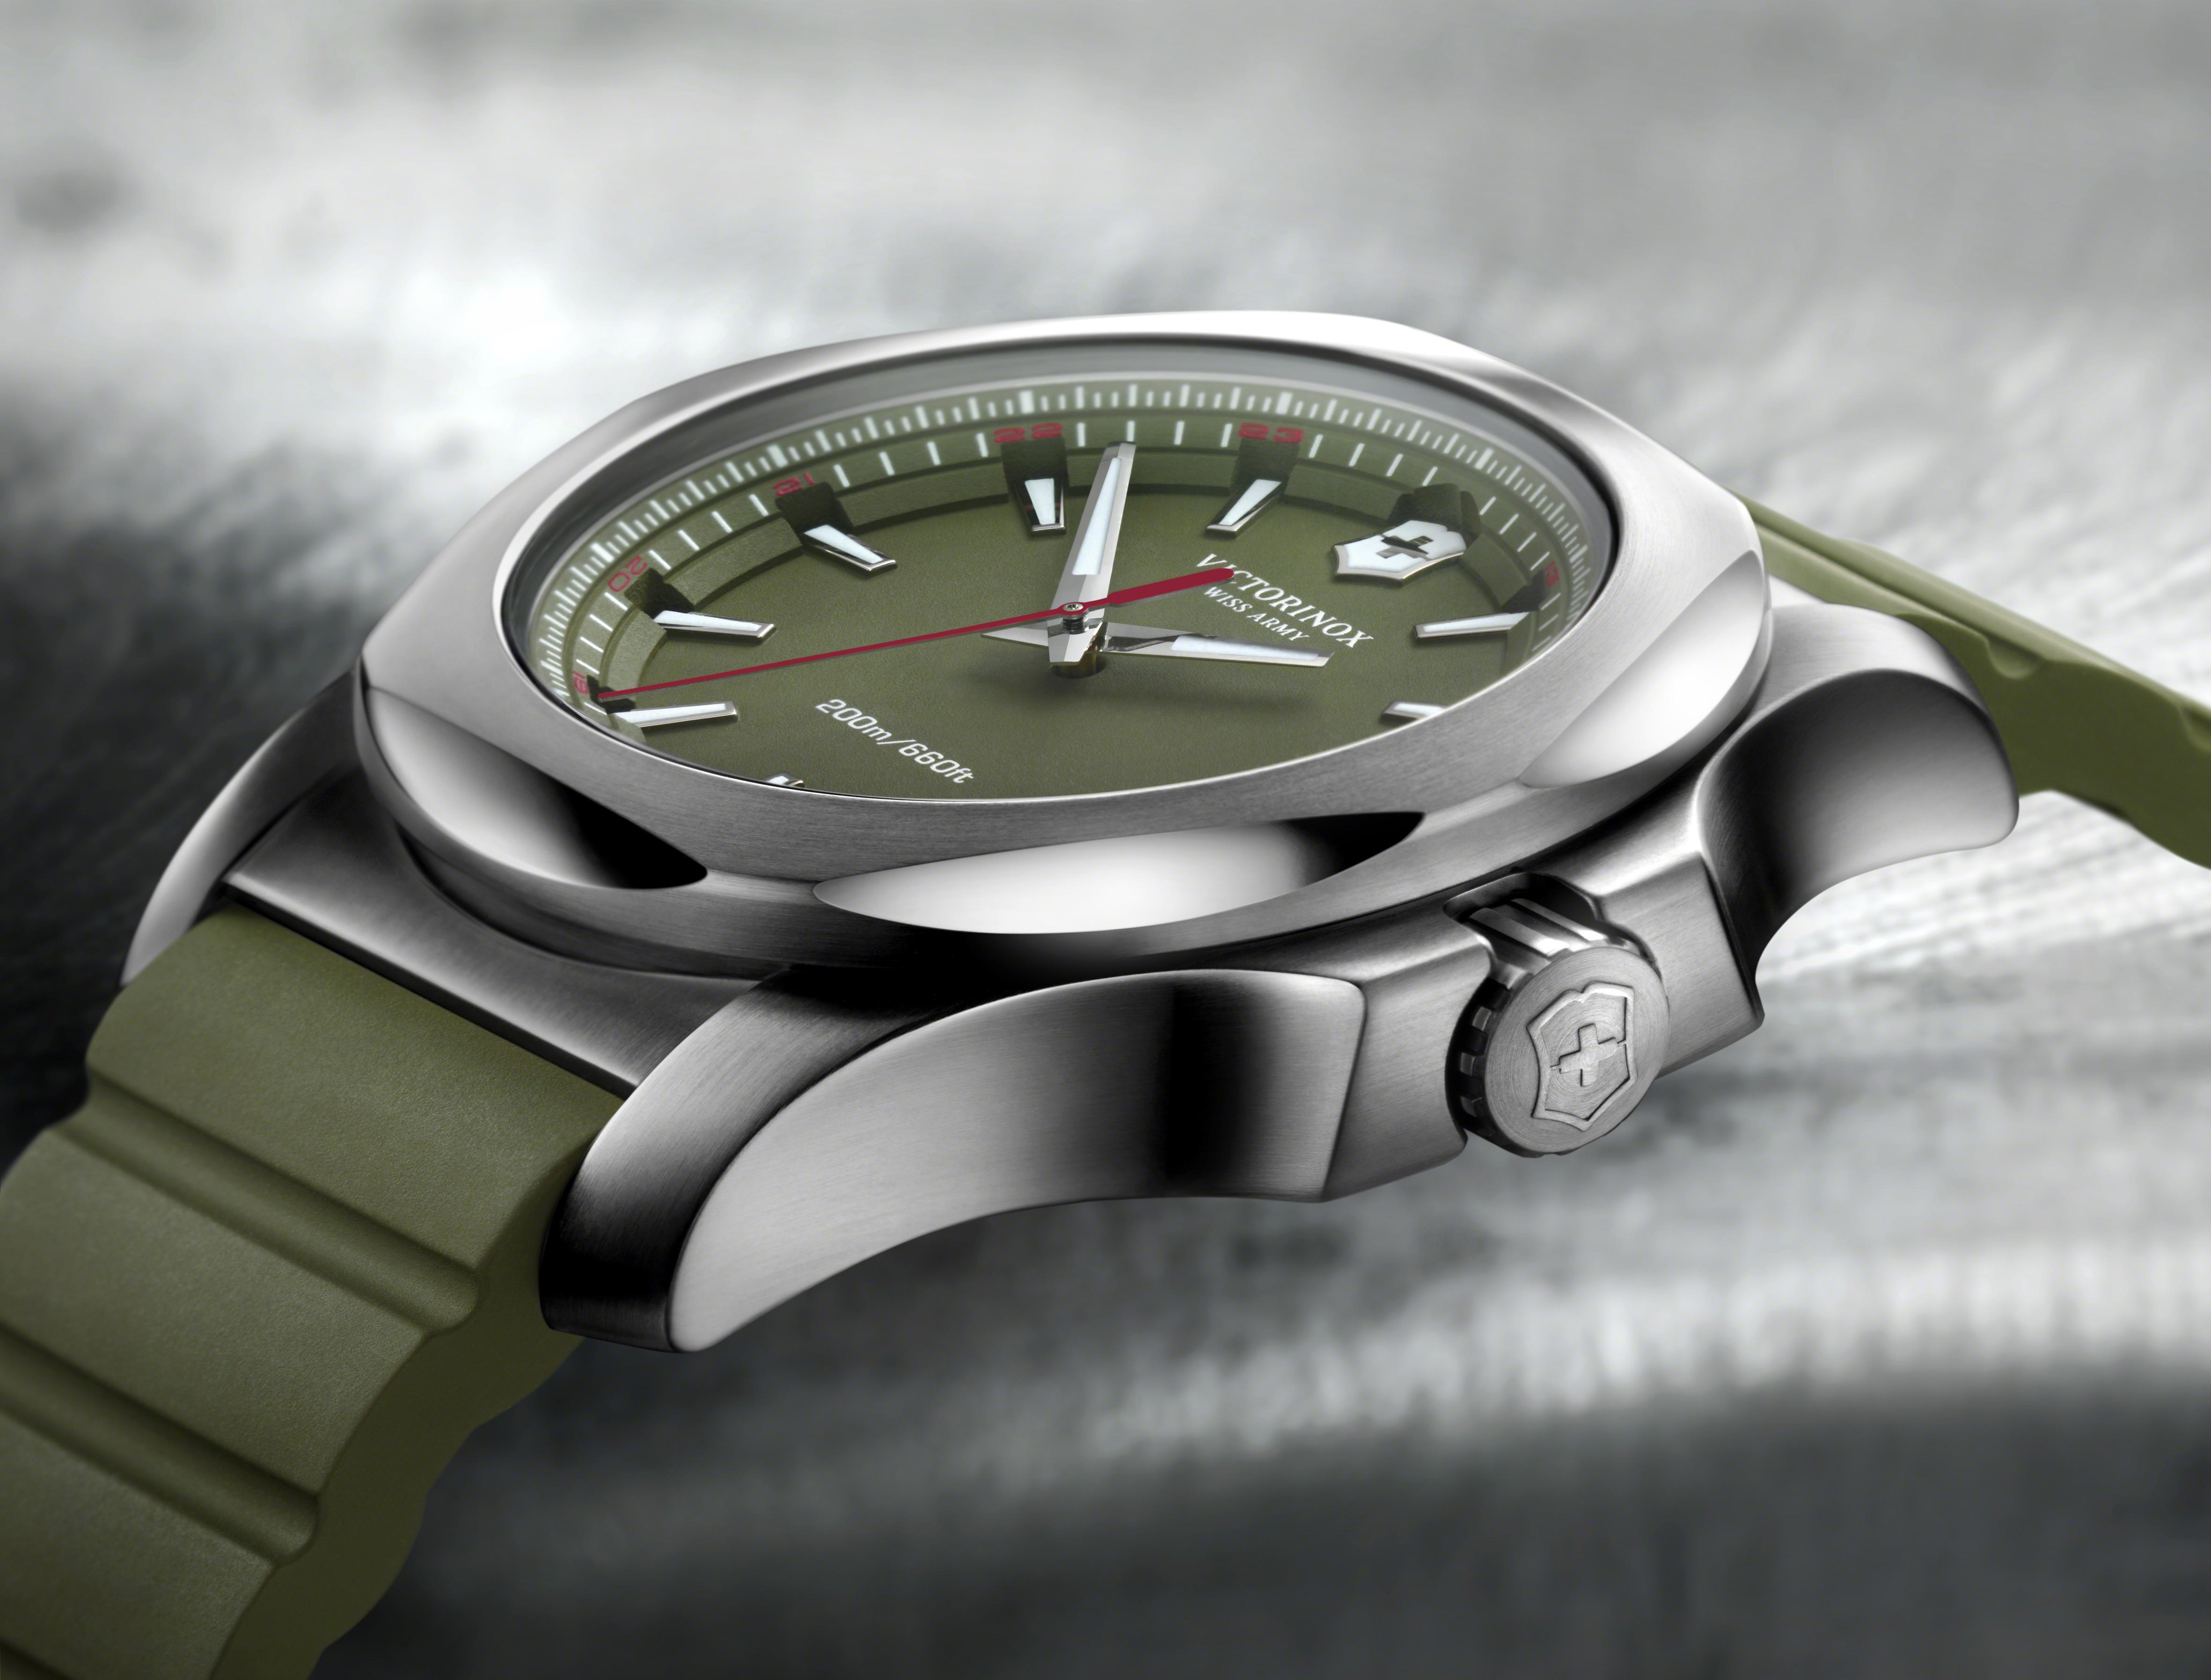 Victorinox-inox-watch-green